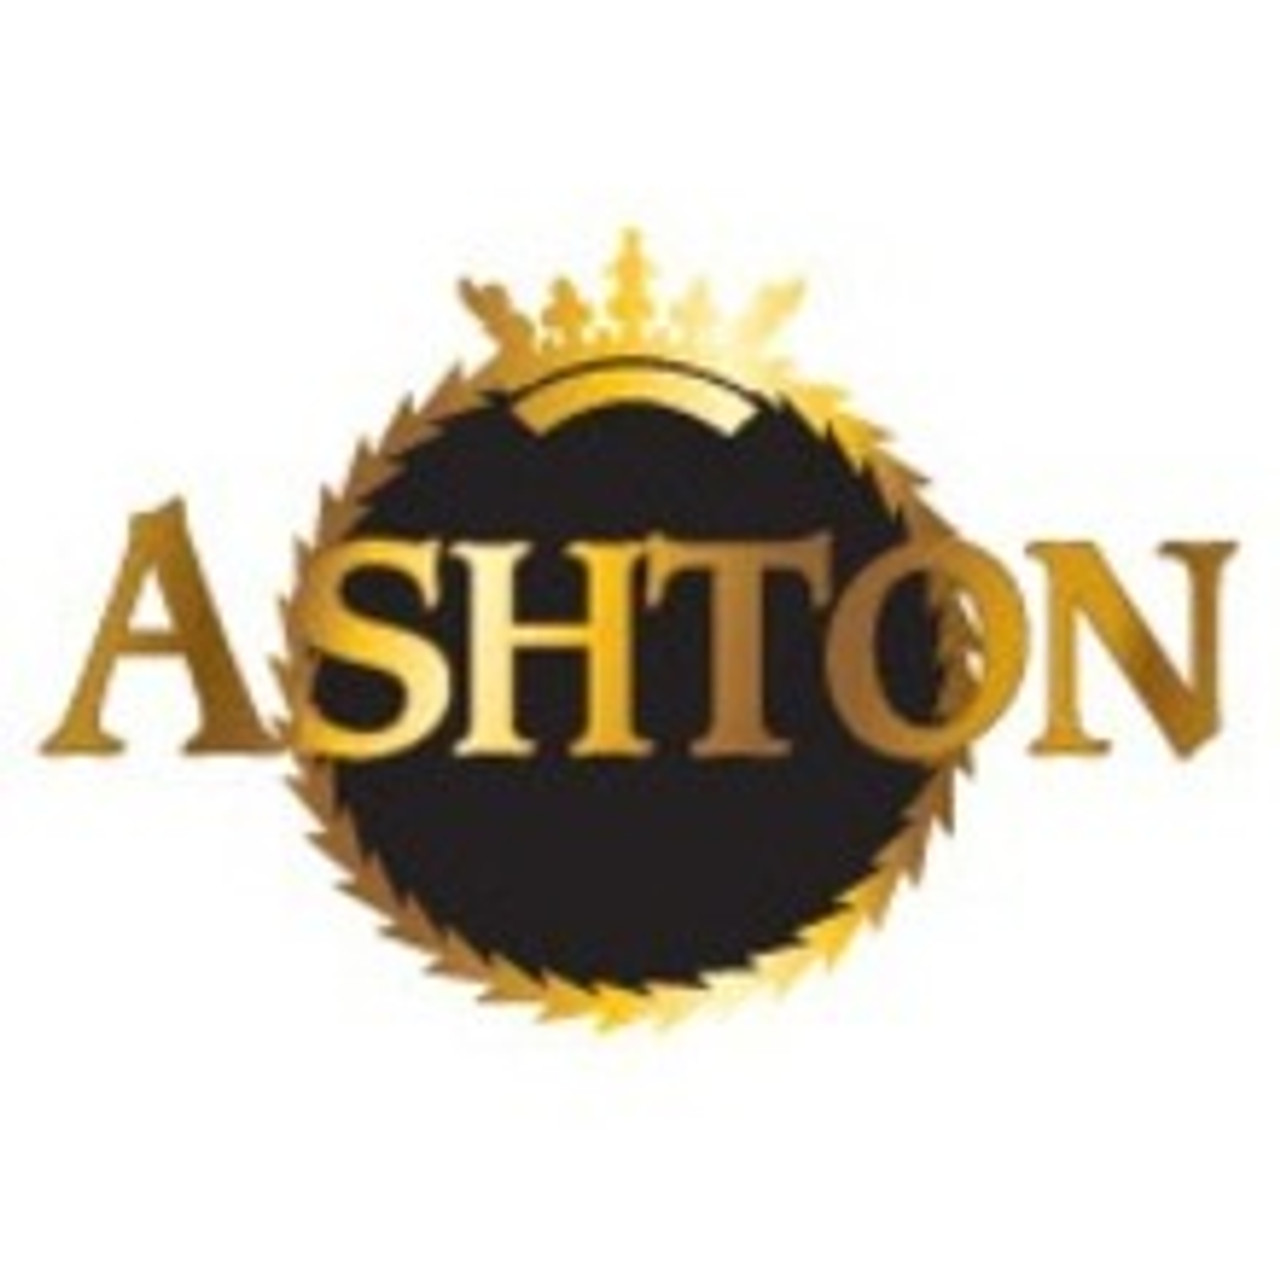 Ashton Cabinet Tres Petite Cigars - 4 3/8 x 42 (Cedar Chest of 25)